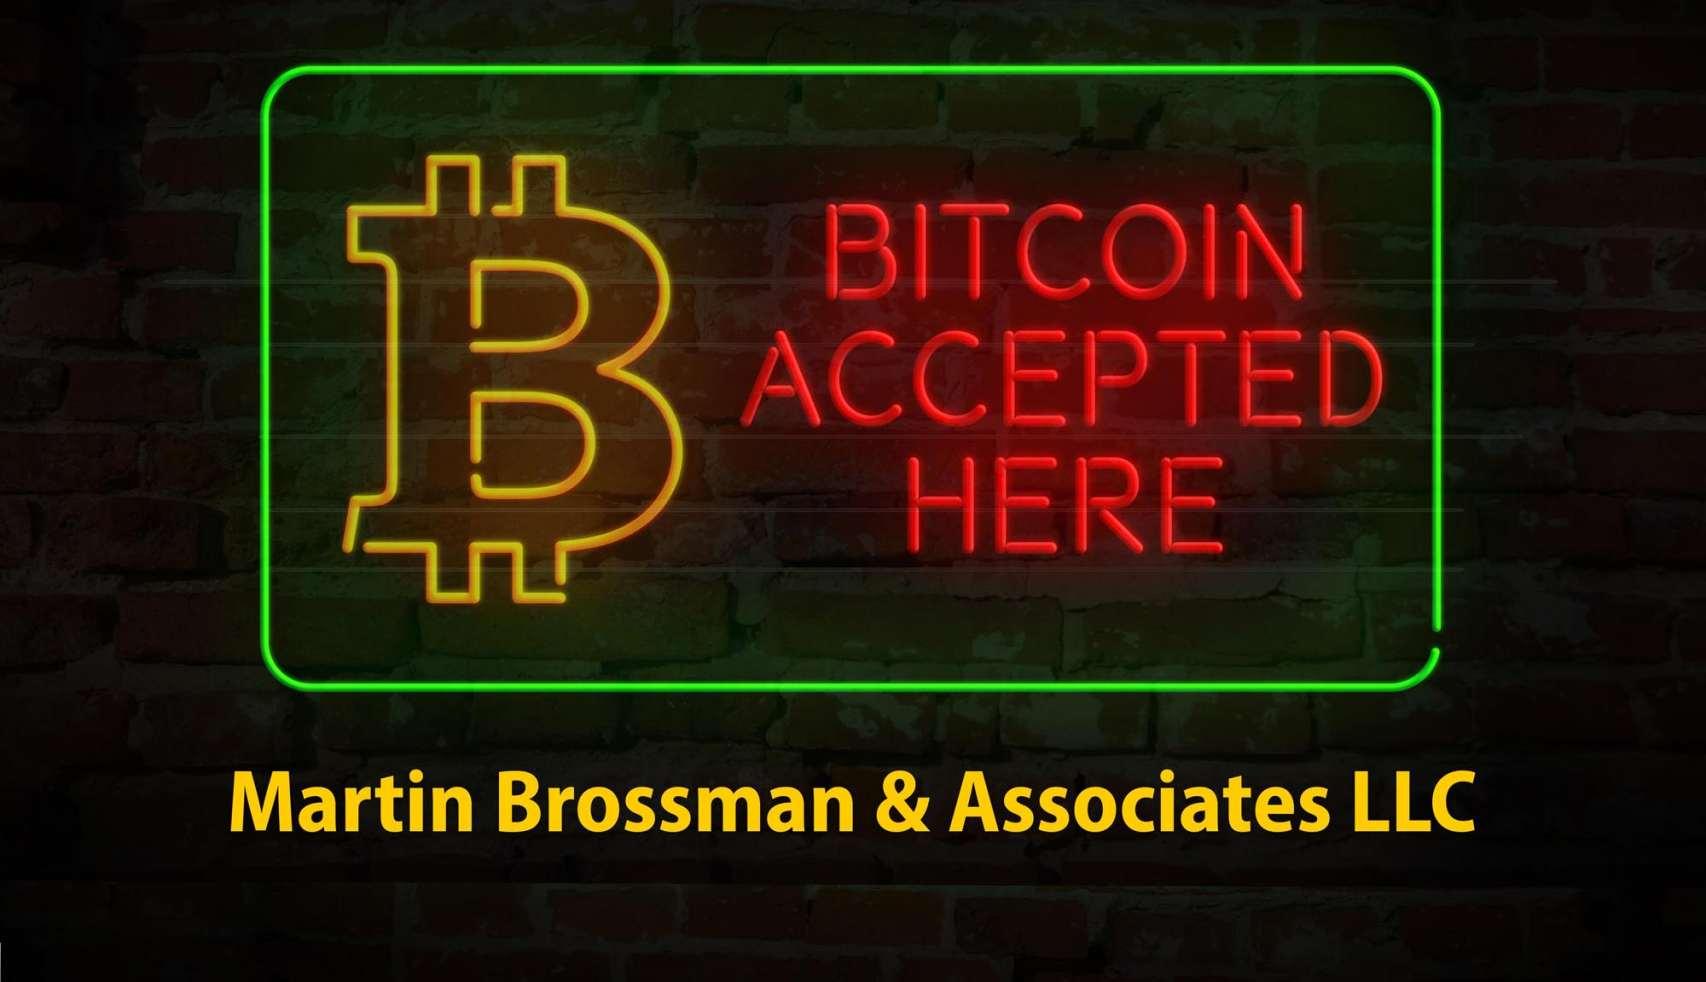 Martin Brossman & Associates LLC Accepts Crypto